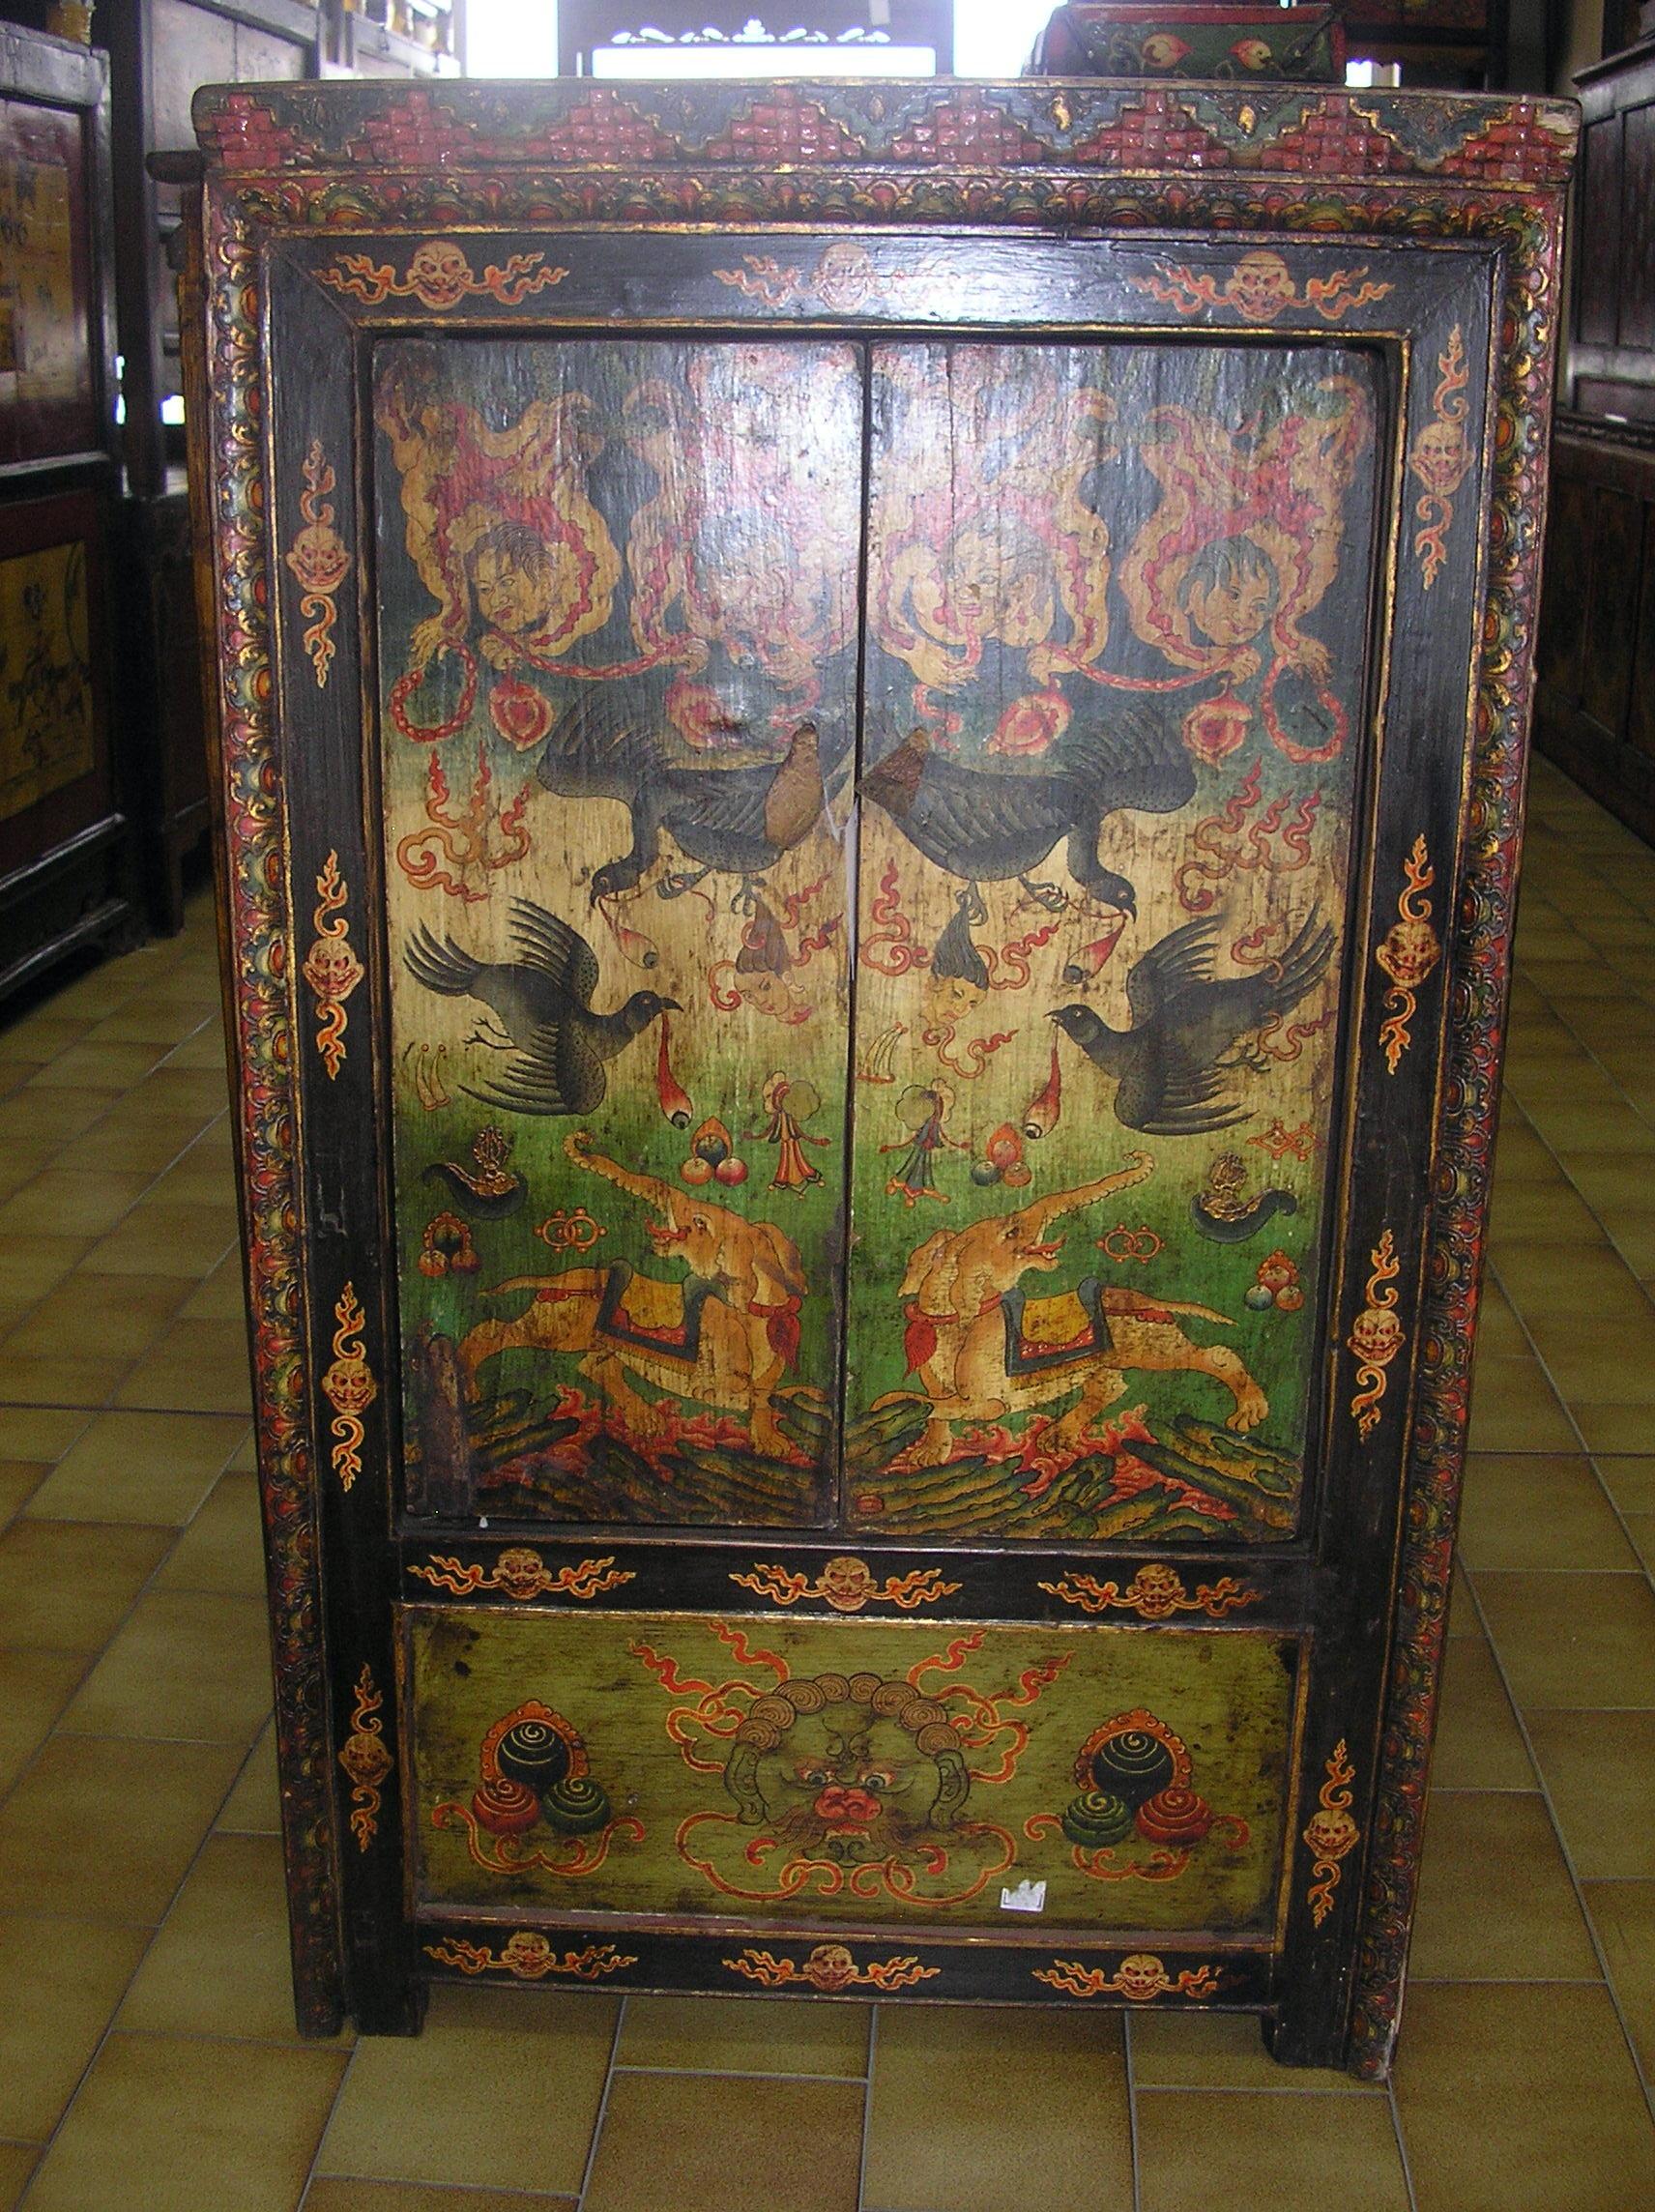 Latitudini mobili le tipologie dei mobili tibetani - Cornice dei mobili ...